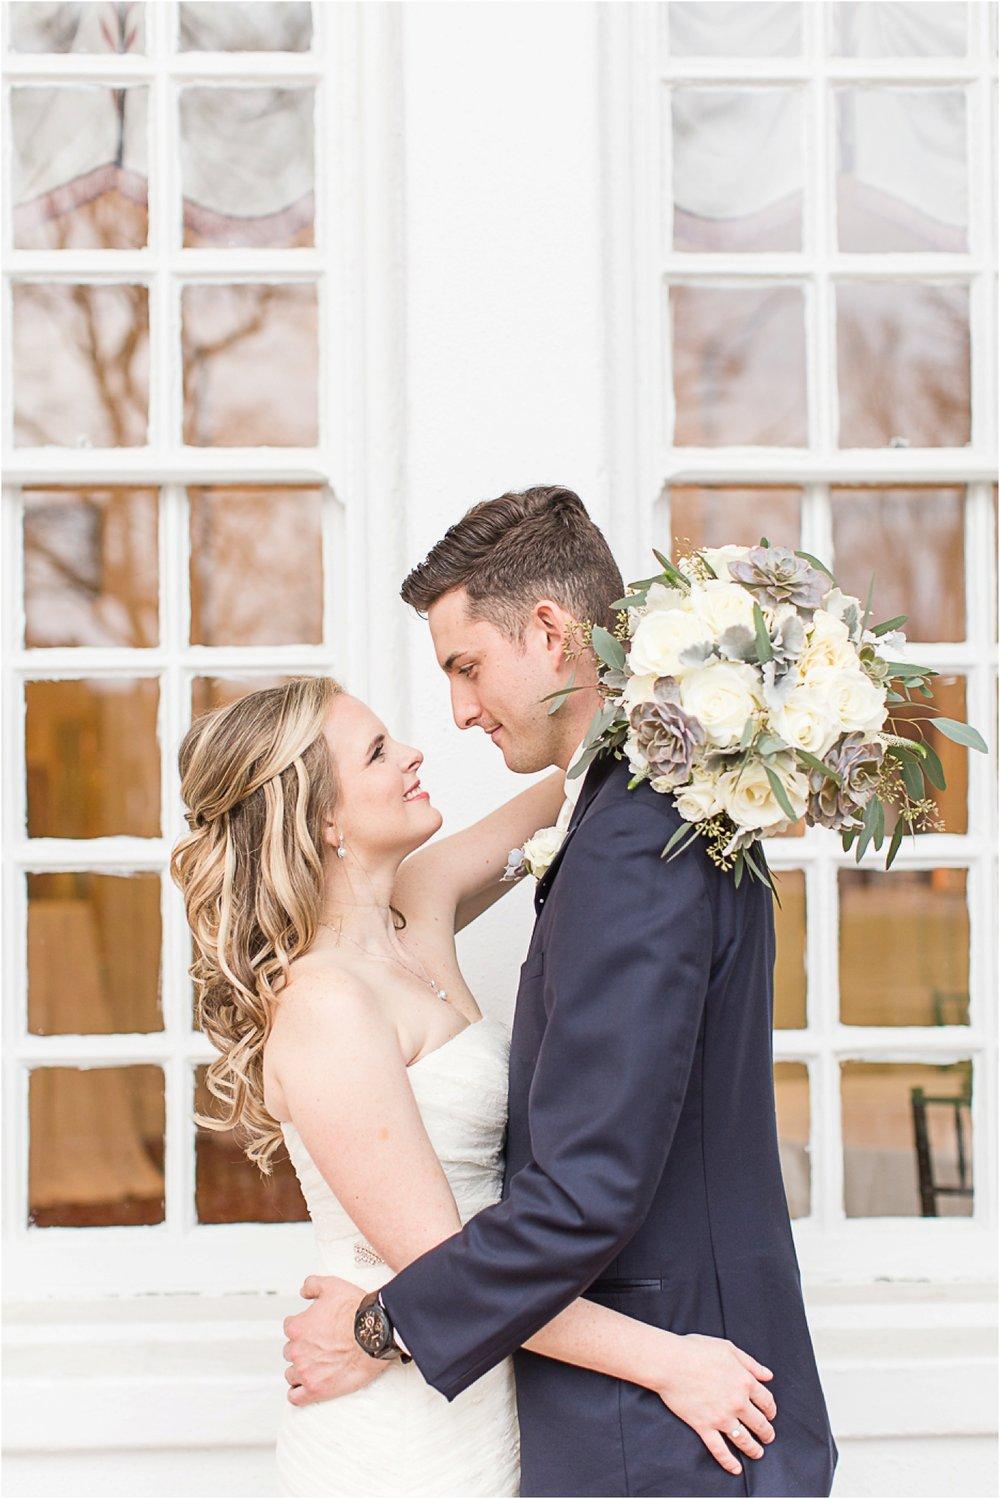 Greyrock-mansion-wedding-52.jpg